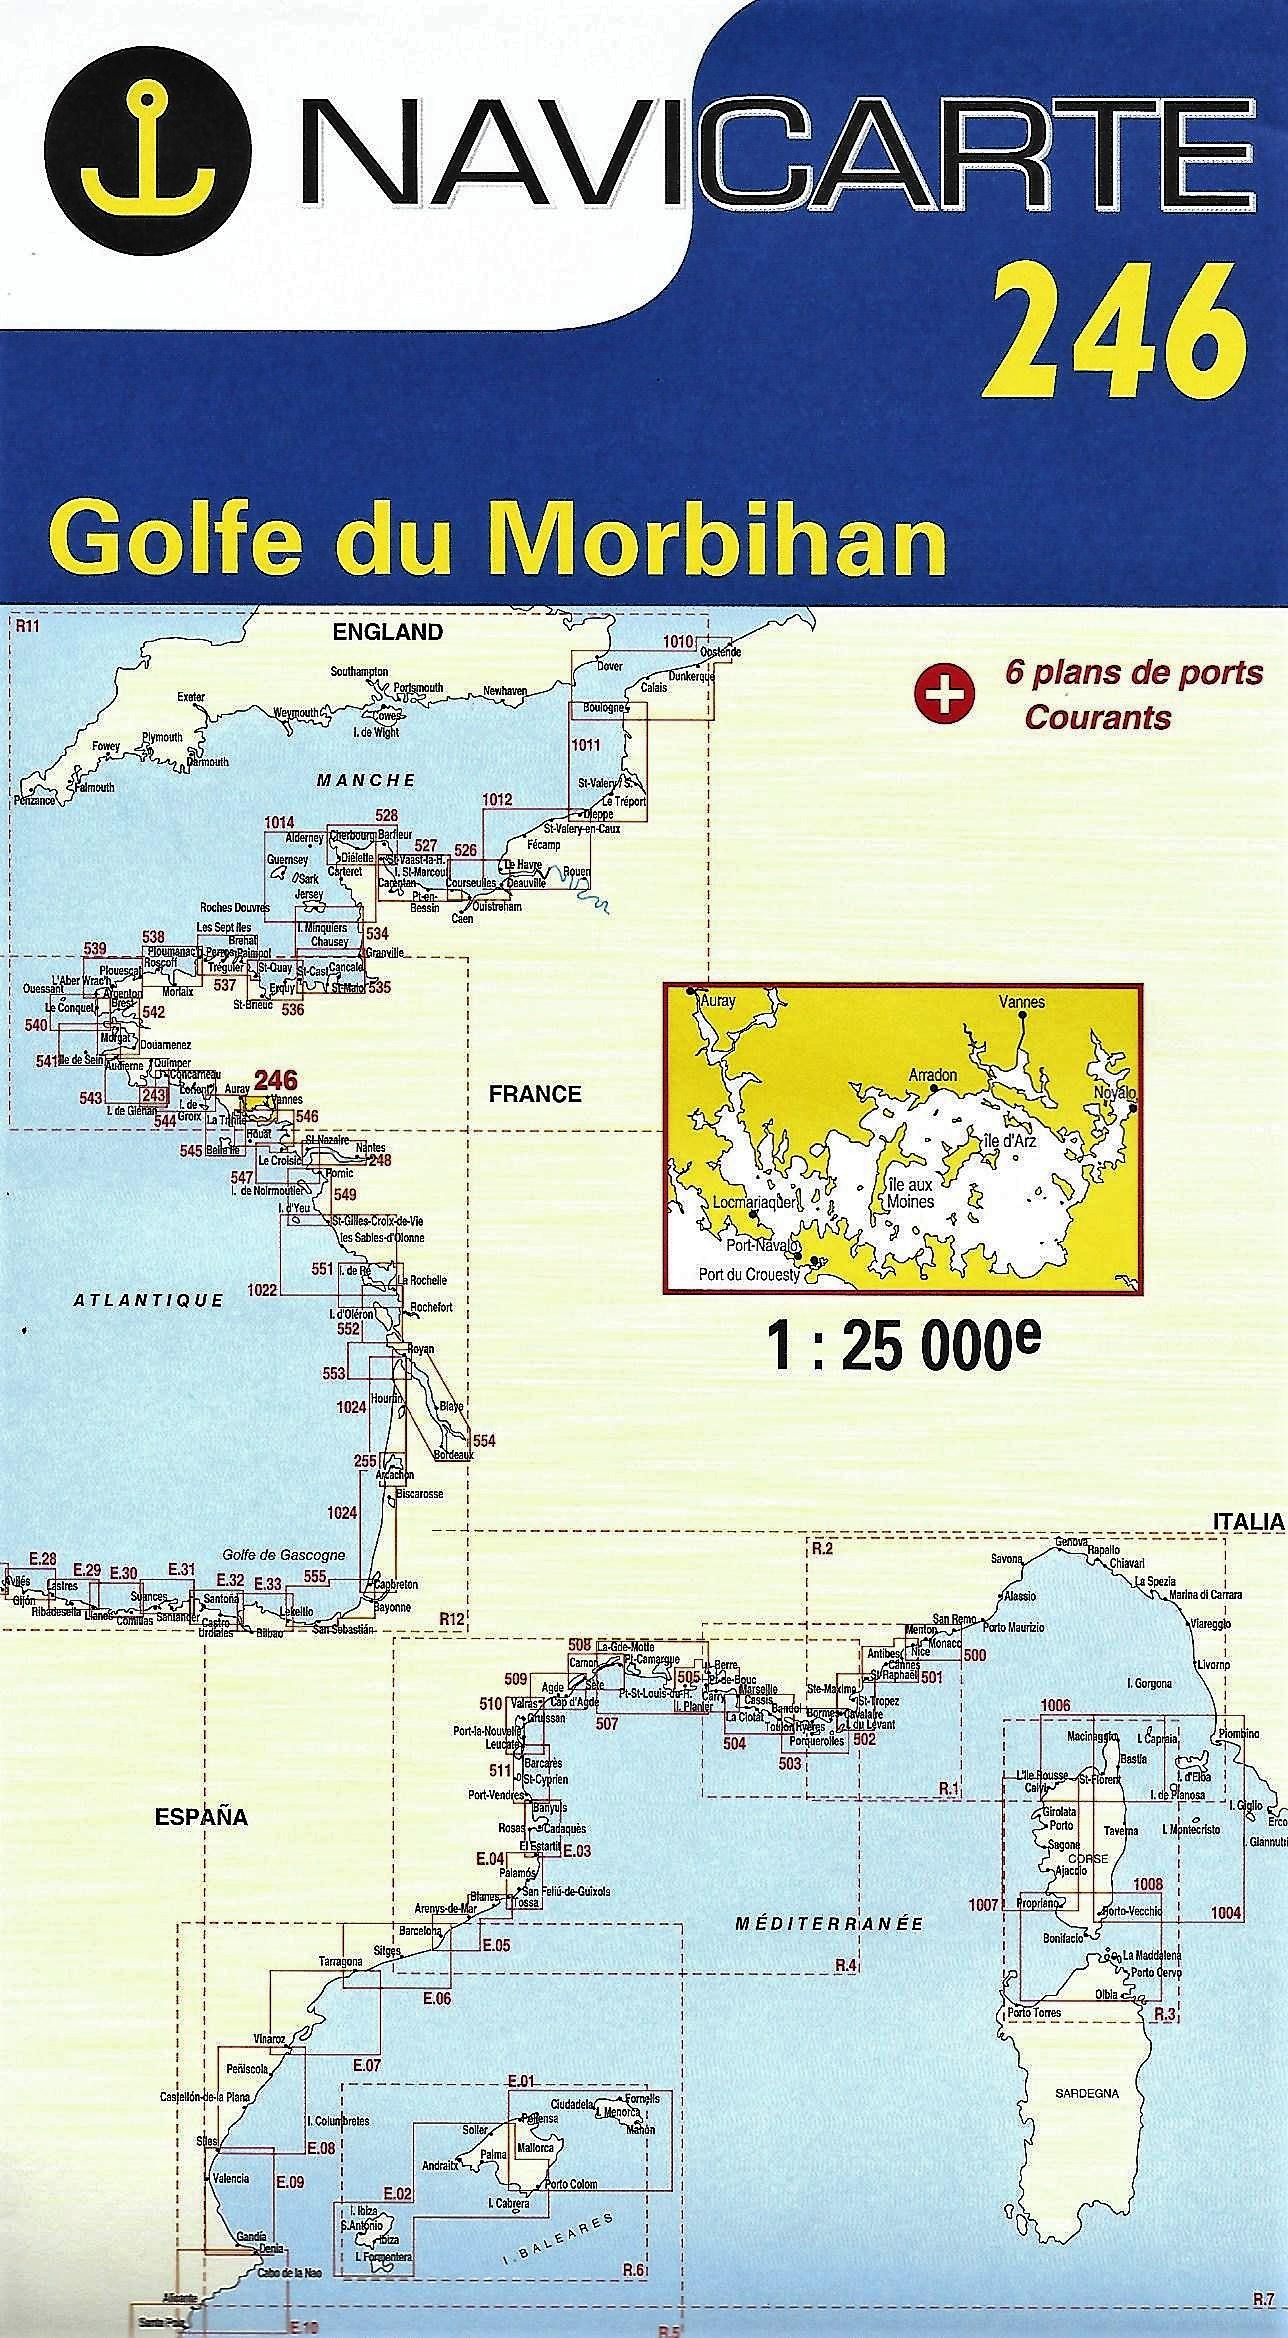 Carte marine Navicarte 246-Golfe du Morbihan